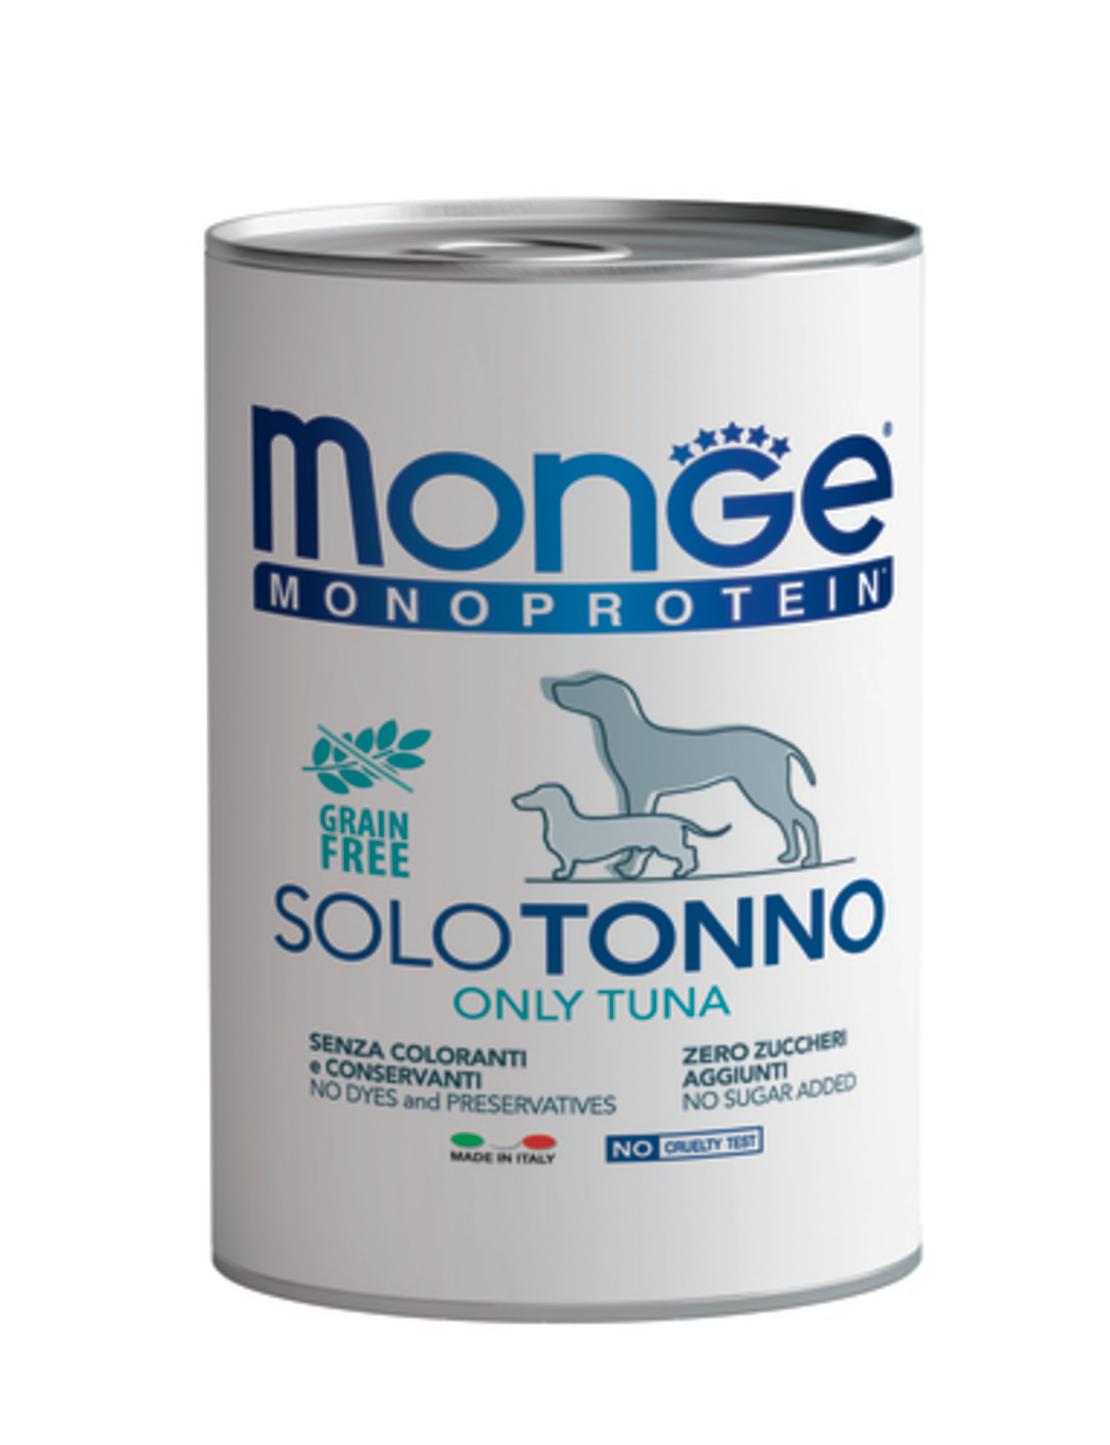 MONGE מונג' מזון רטוב לכלבים מונו פרוטאין בטעם טונה 400 גרם